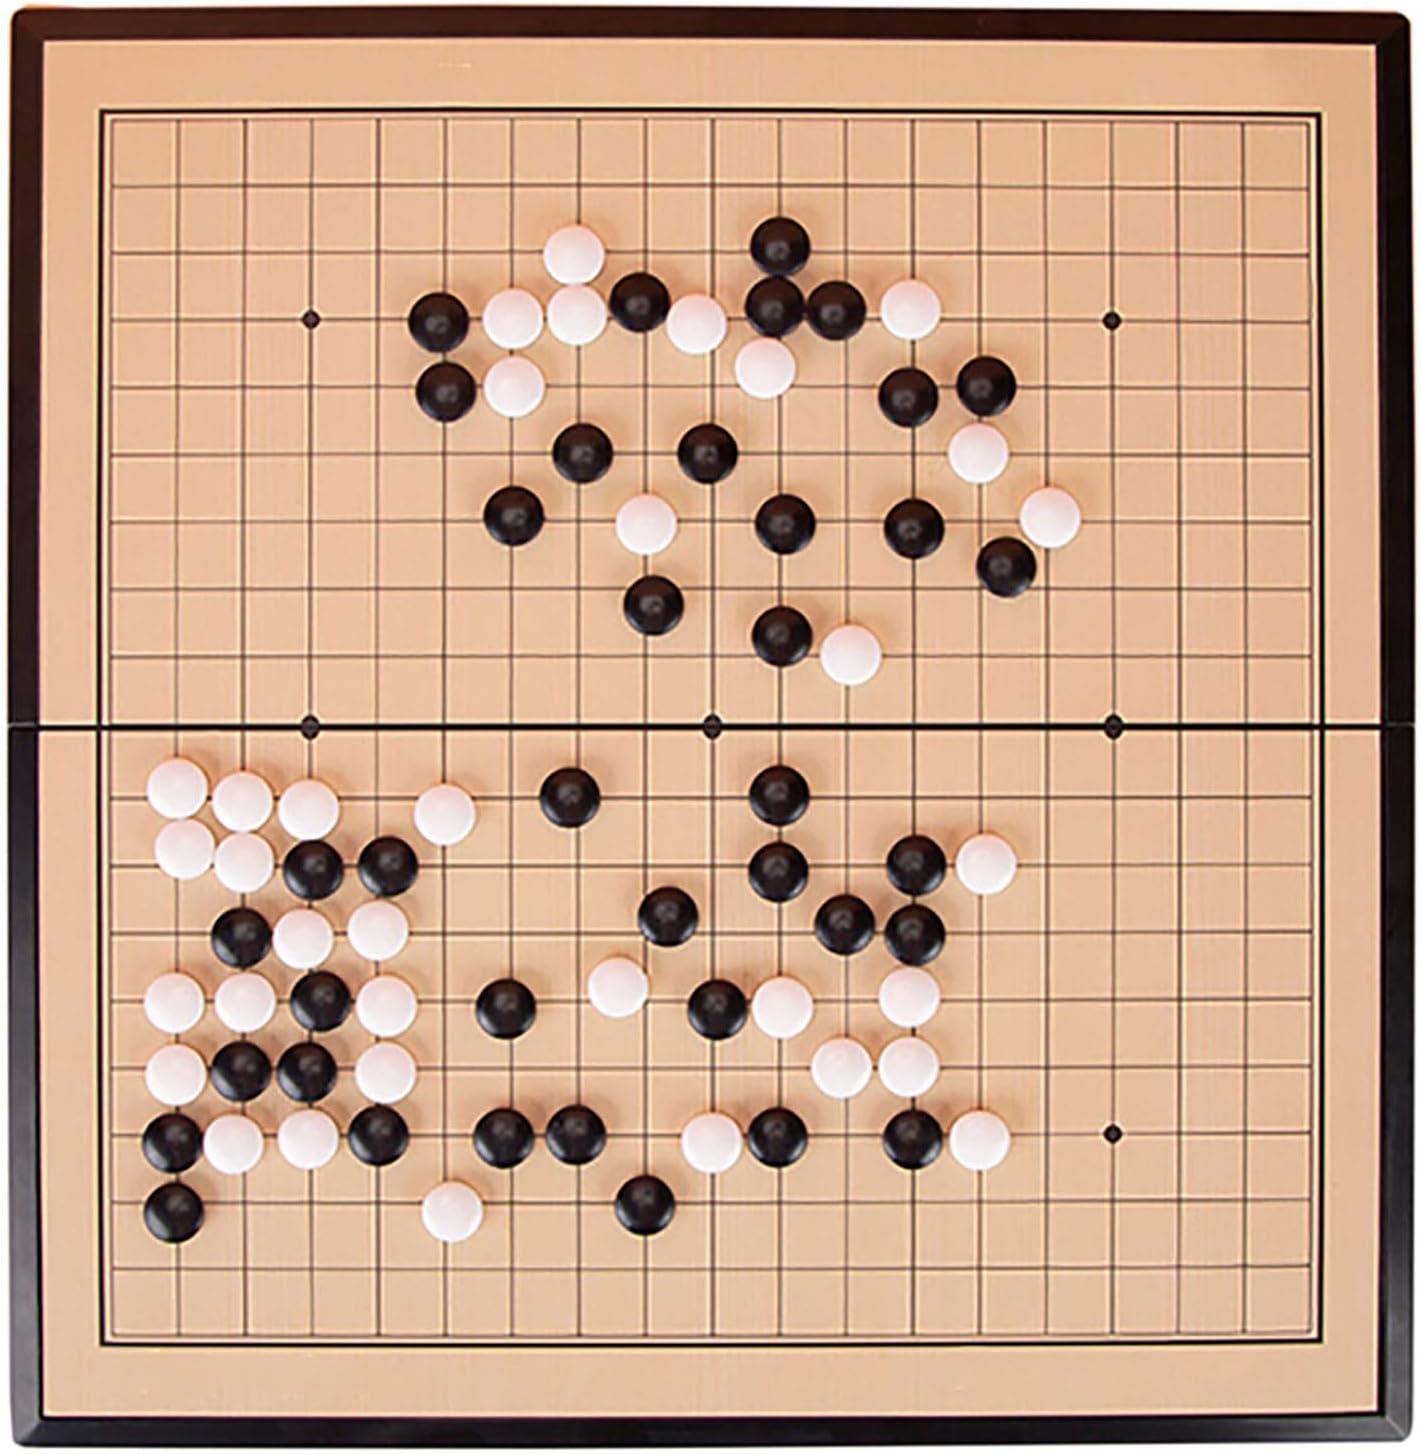 QDY Classic New arrival Strategy Weiqi Game Portland Mall Single Chess Go Ga Convex Stones